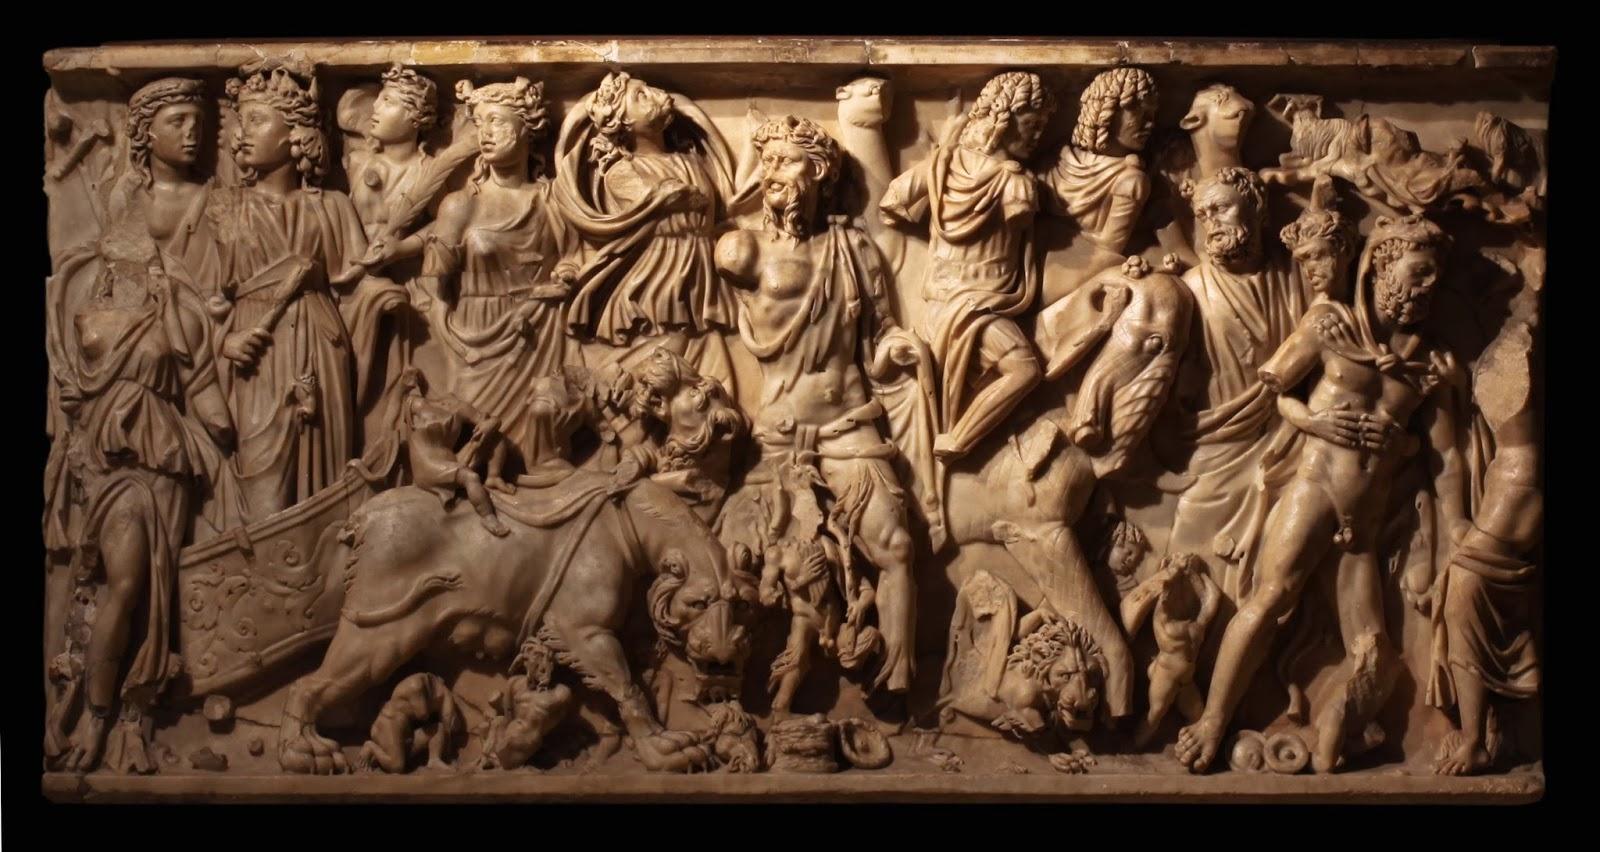 Dieu grec de l'amour érotique